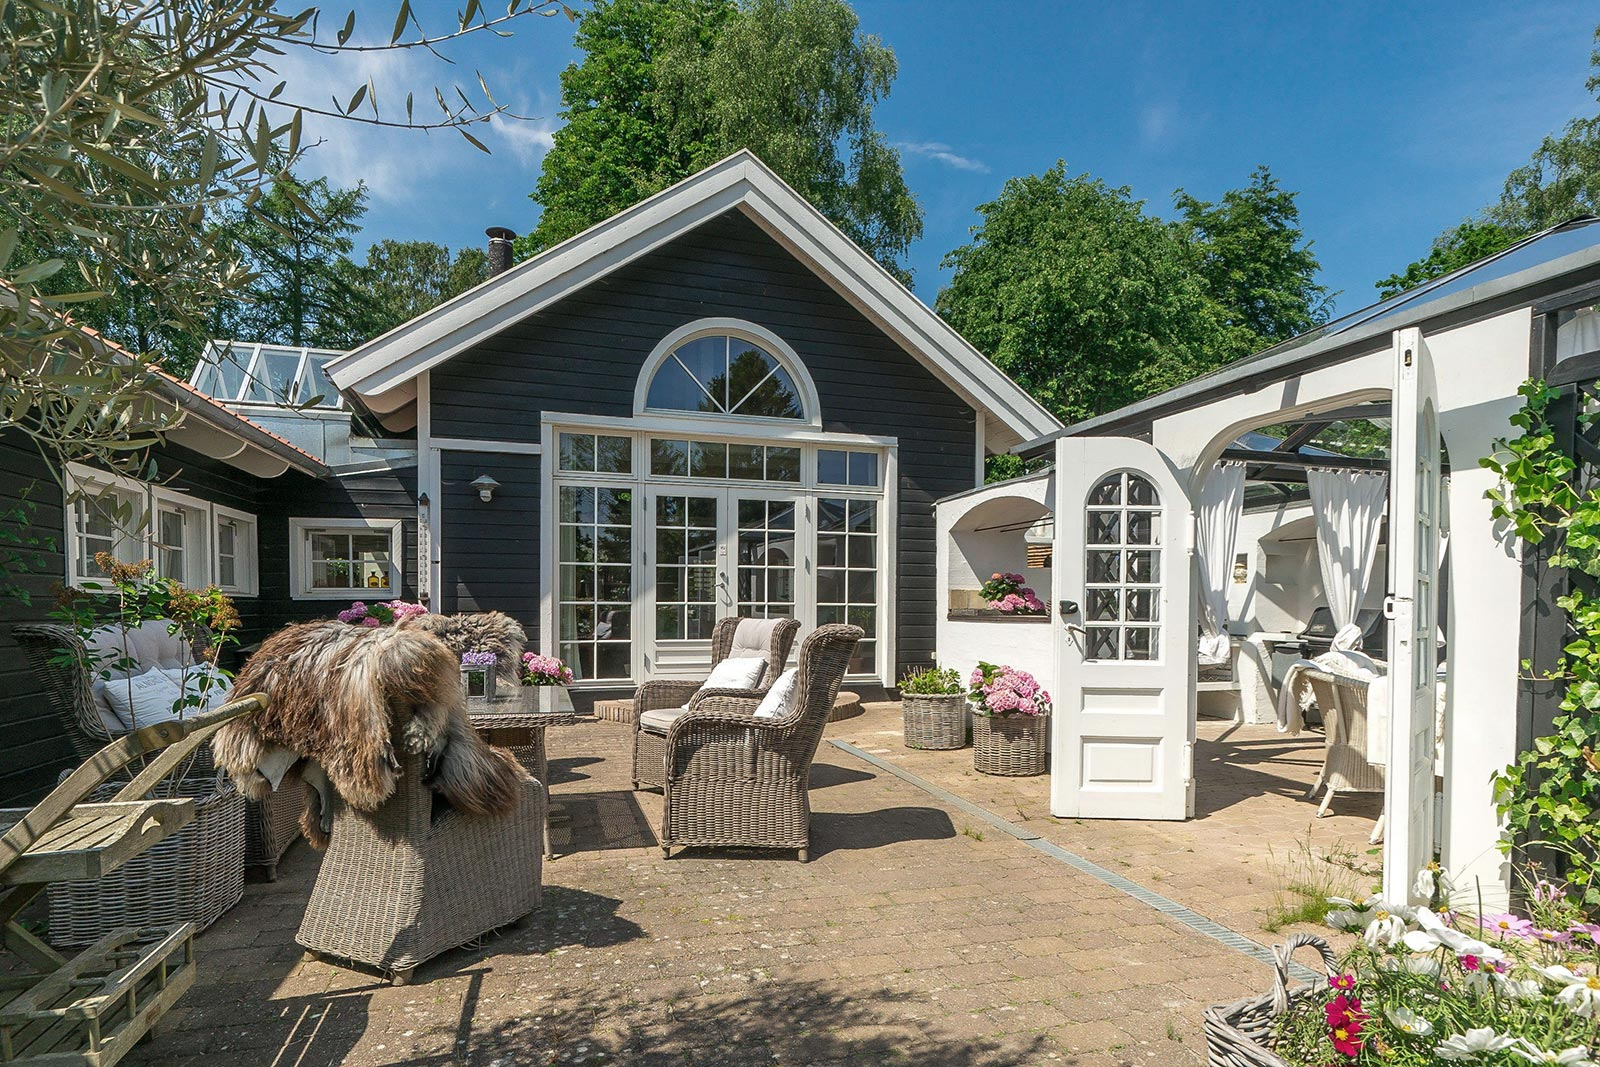 Cozy outdoor living space